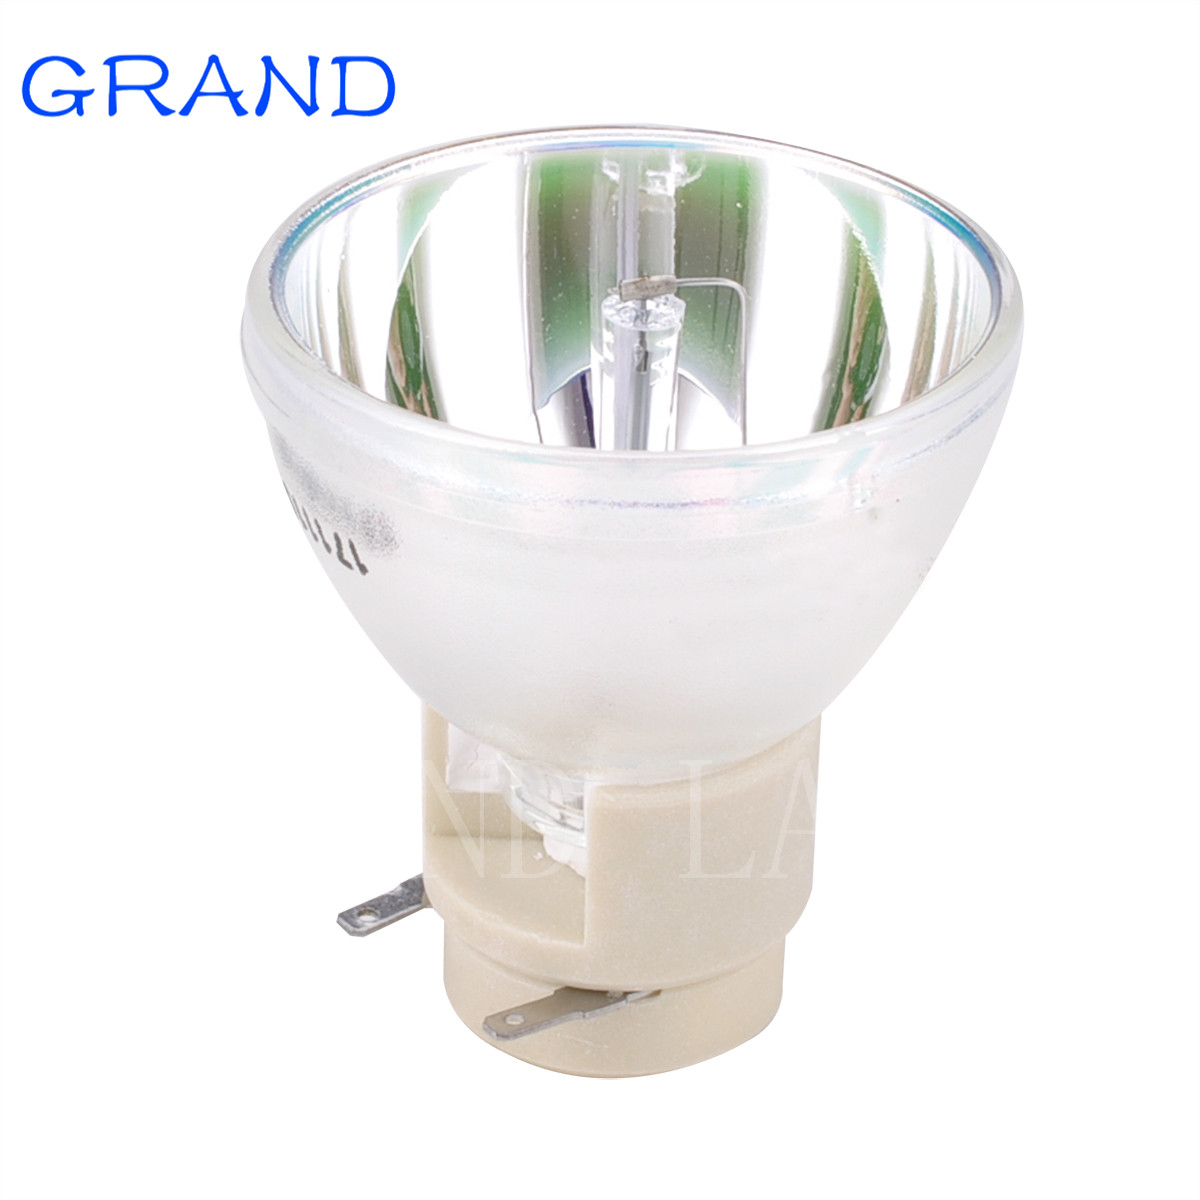 Replacement S5201M H7531D H7550ST P1203 P1206 P1303W M112 M114 D510 For Acer Projector Bulb Lamp P-VIP 230/0.8 E20.8